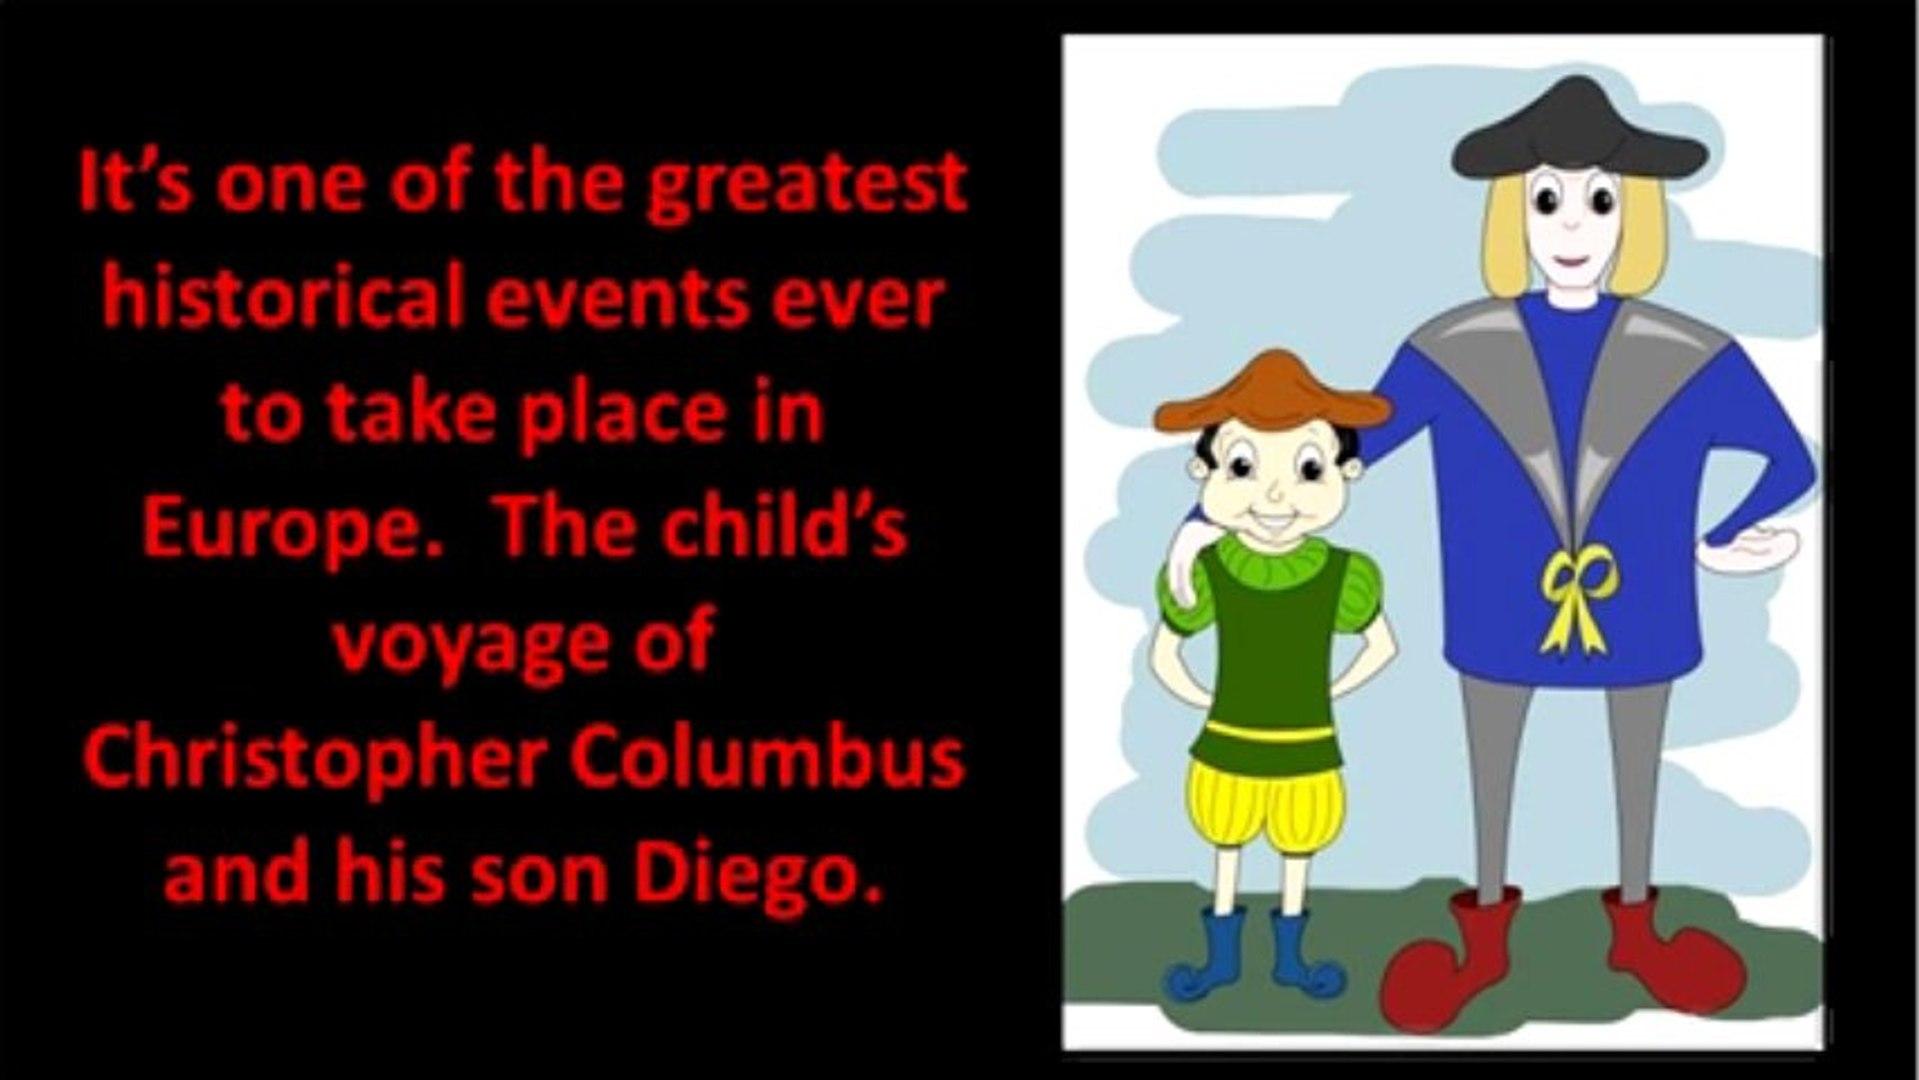 Christopher Columbus Leaving Palos, Spain, Aboard the Santa Maria on His 1st Voyage